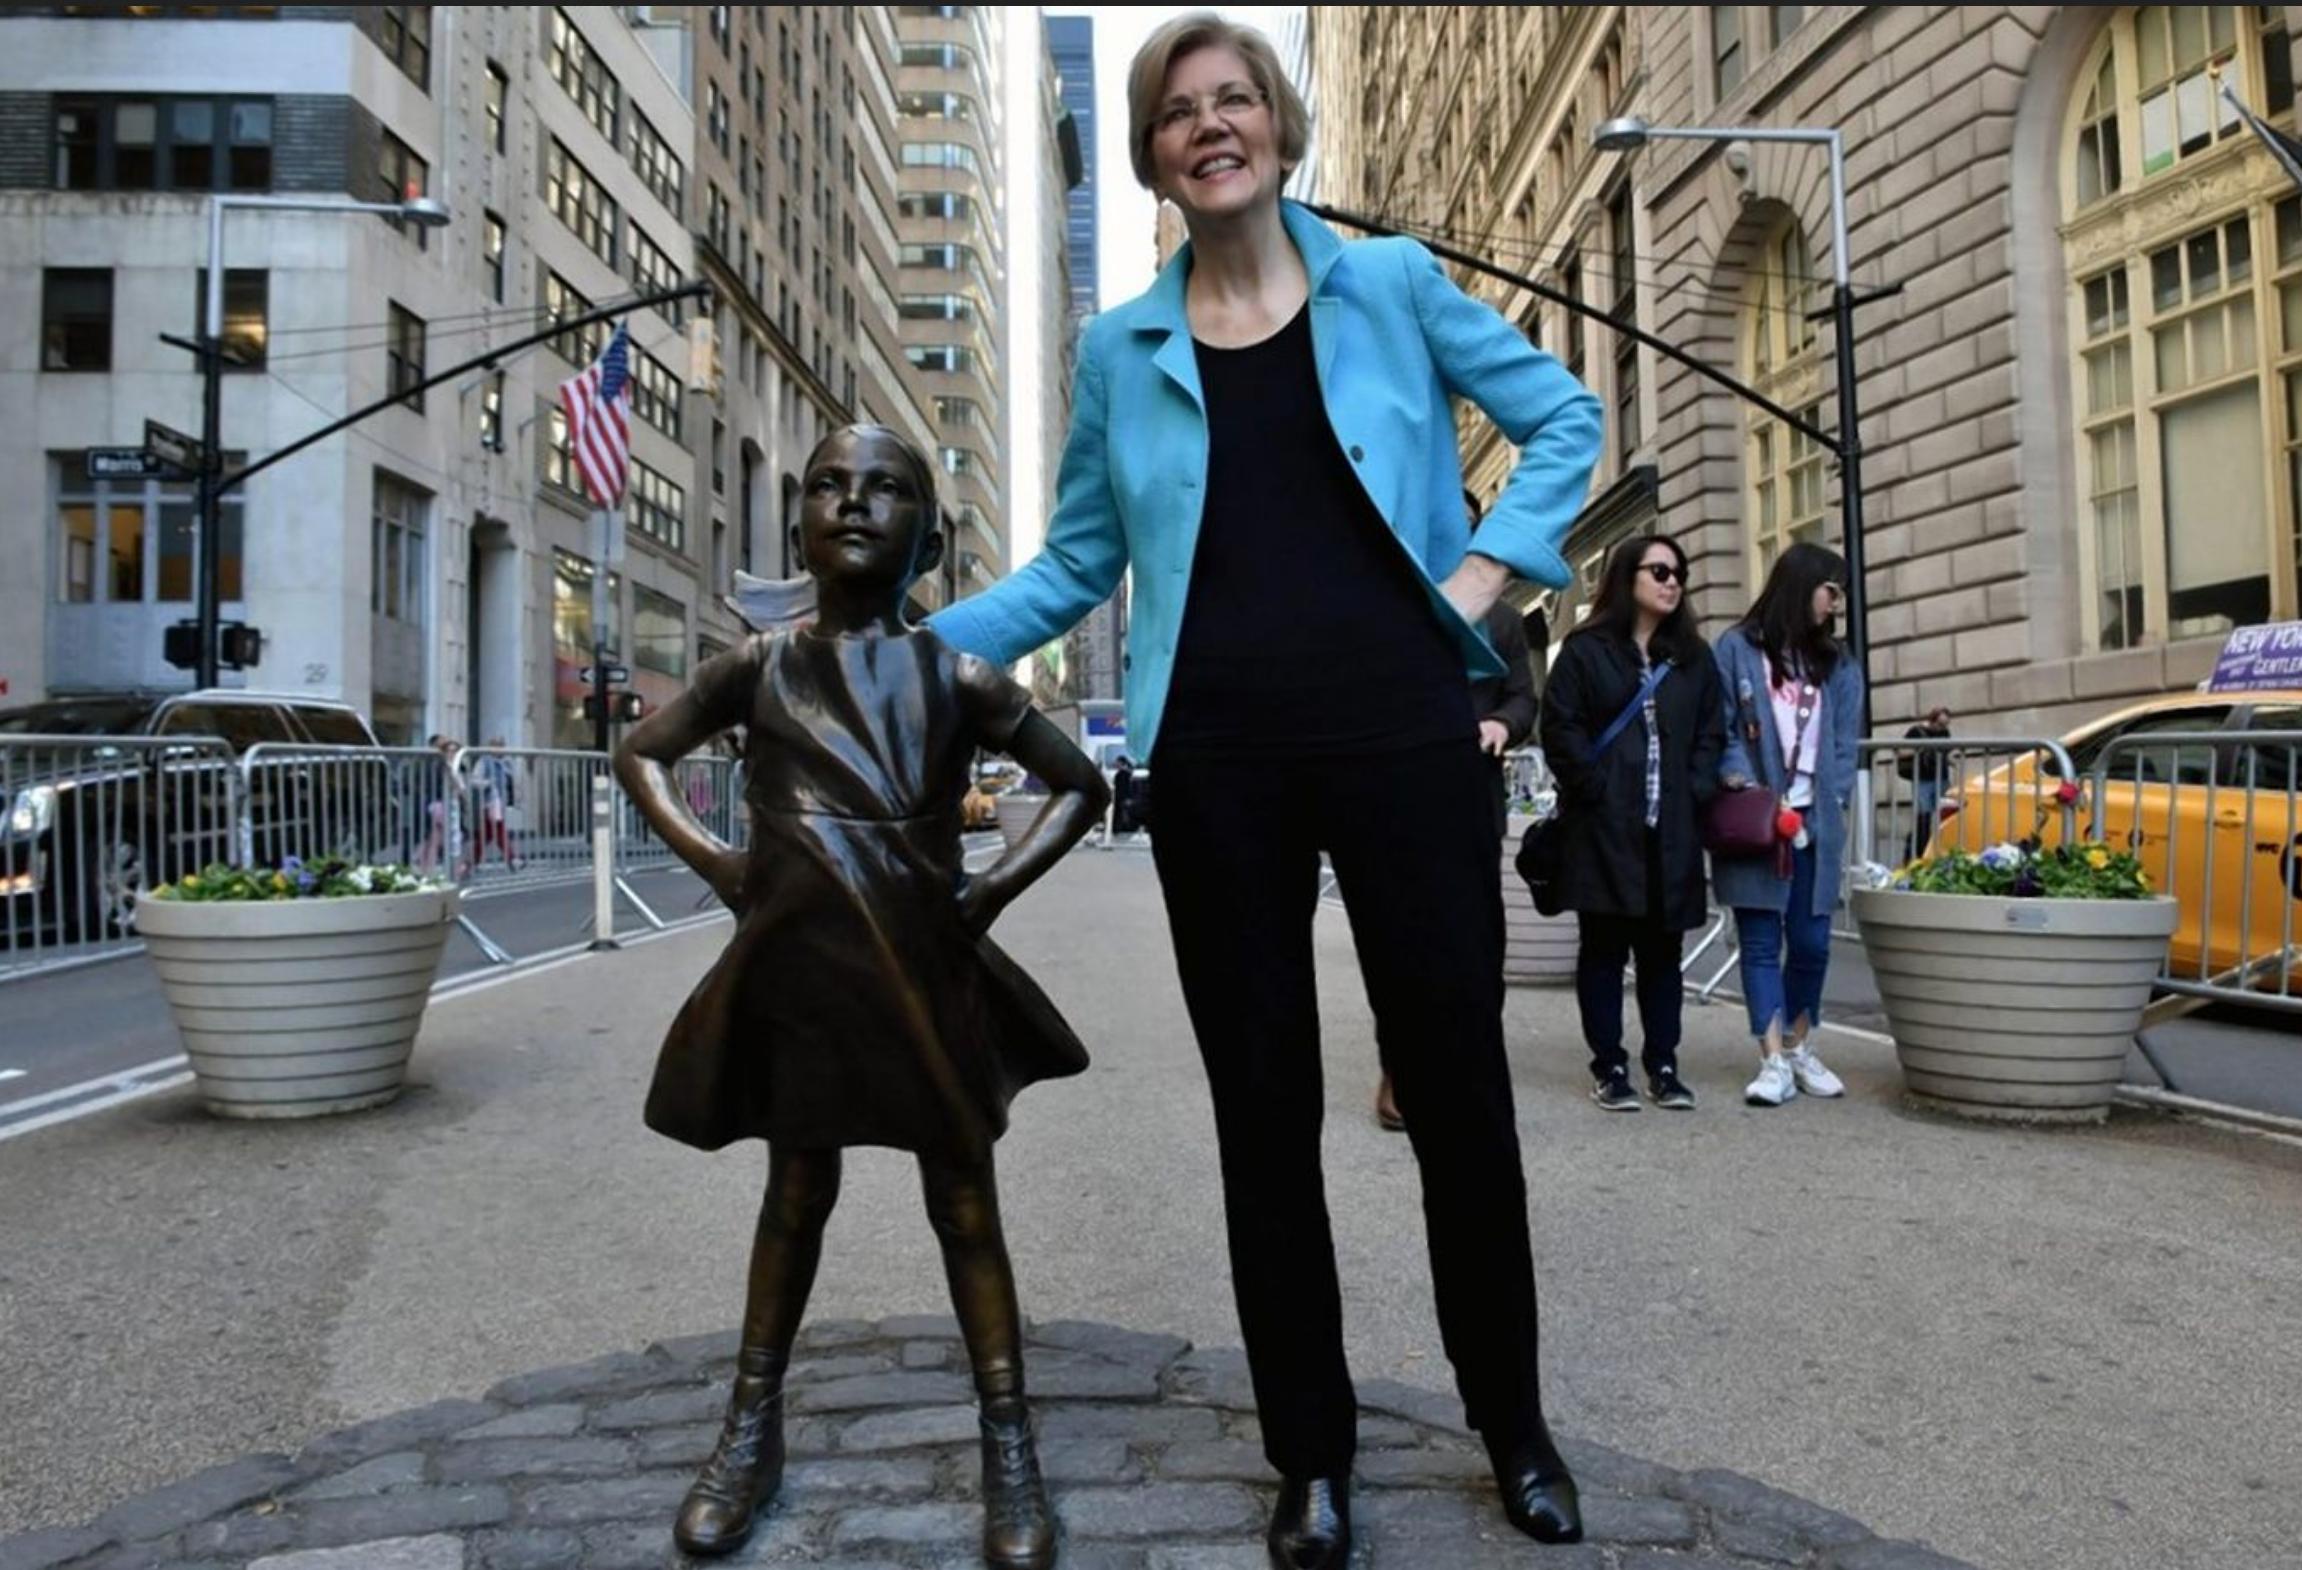 Elizabeth Warren standing with the Fearless Girl statue in Lower Manhattan